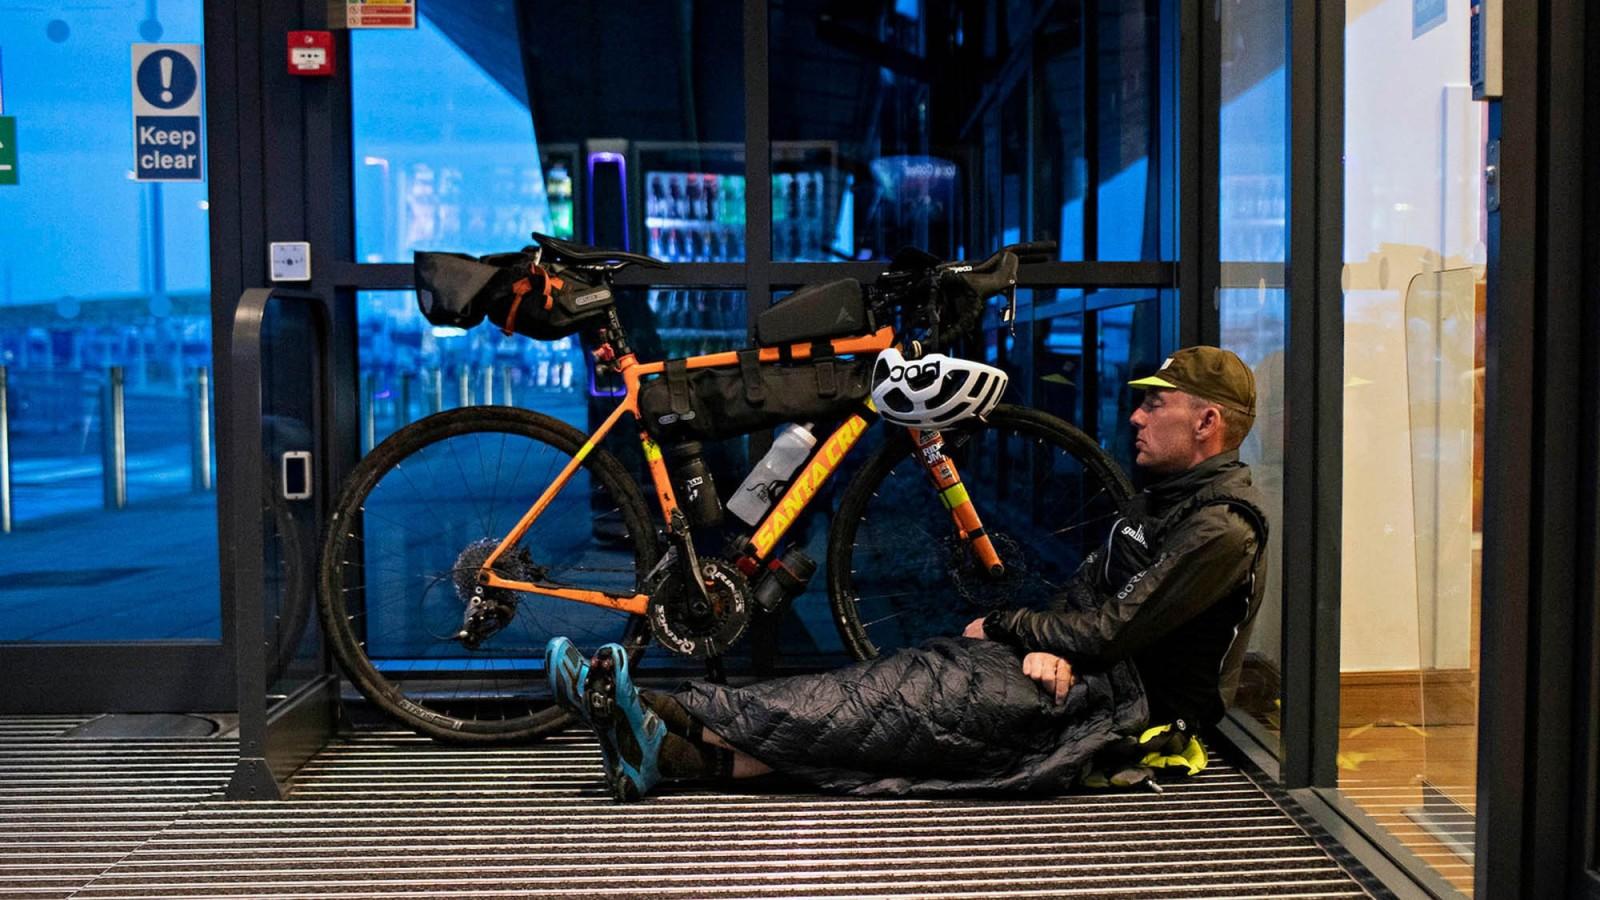 Bikes of Pan Celtic Race